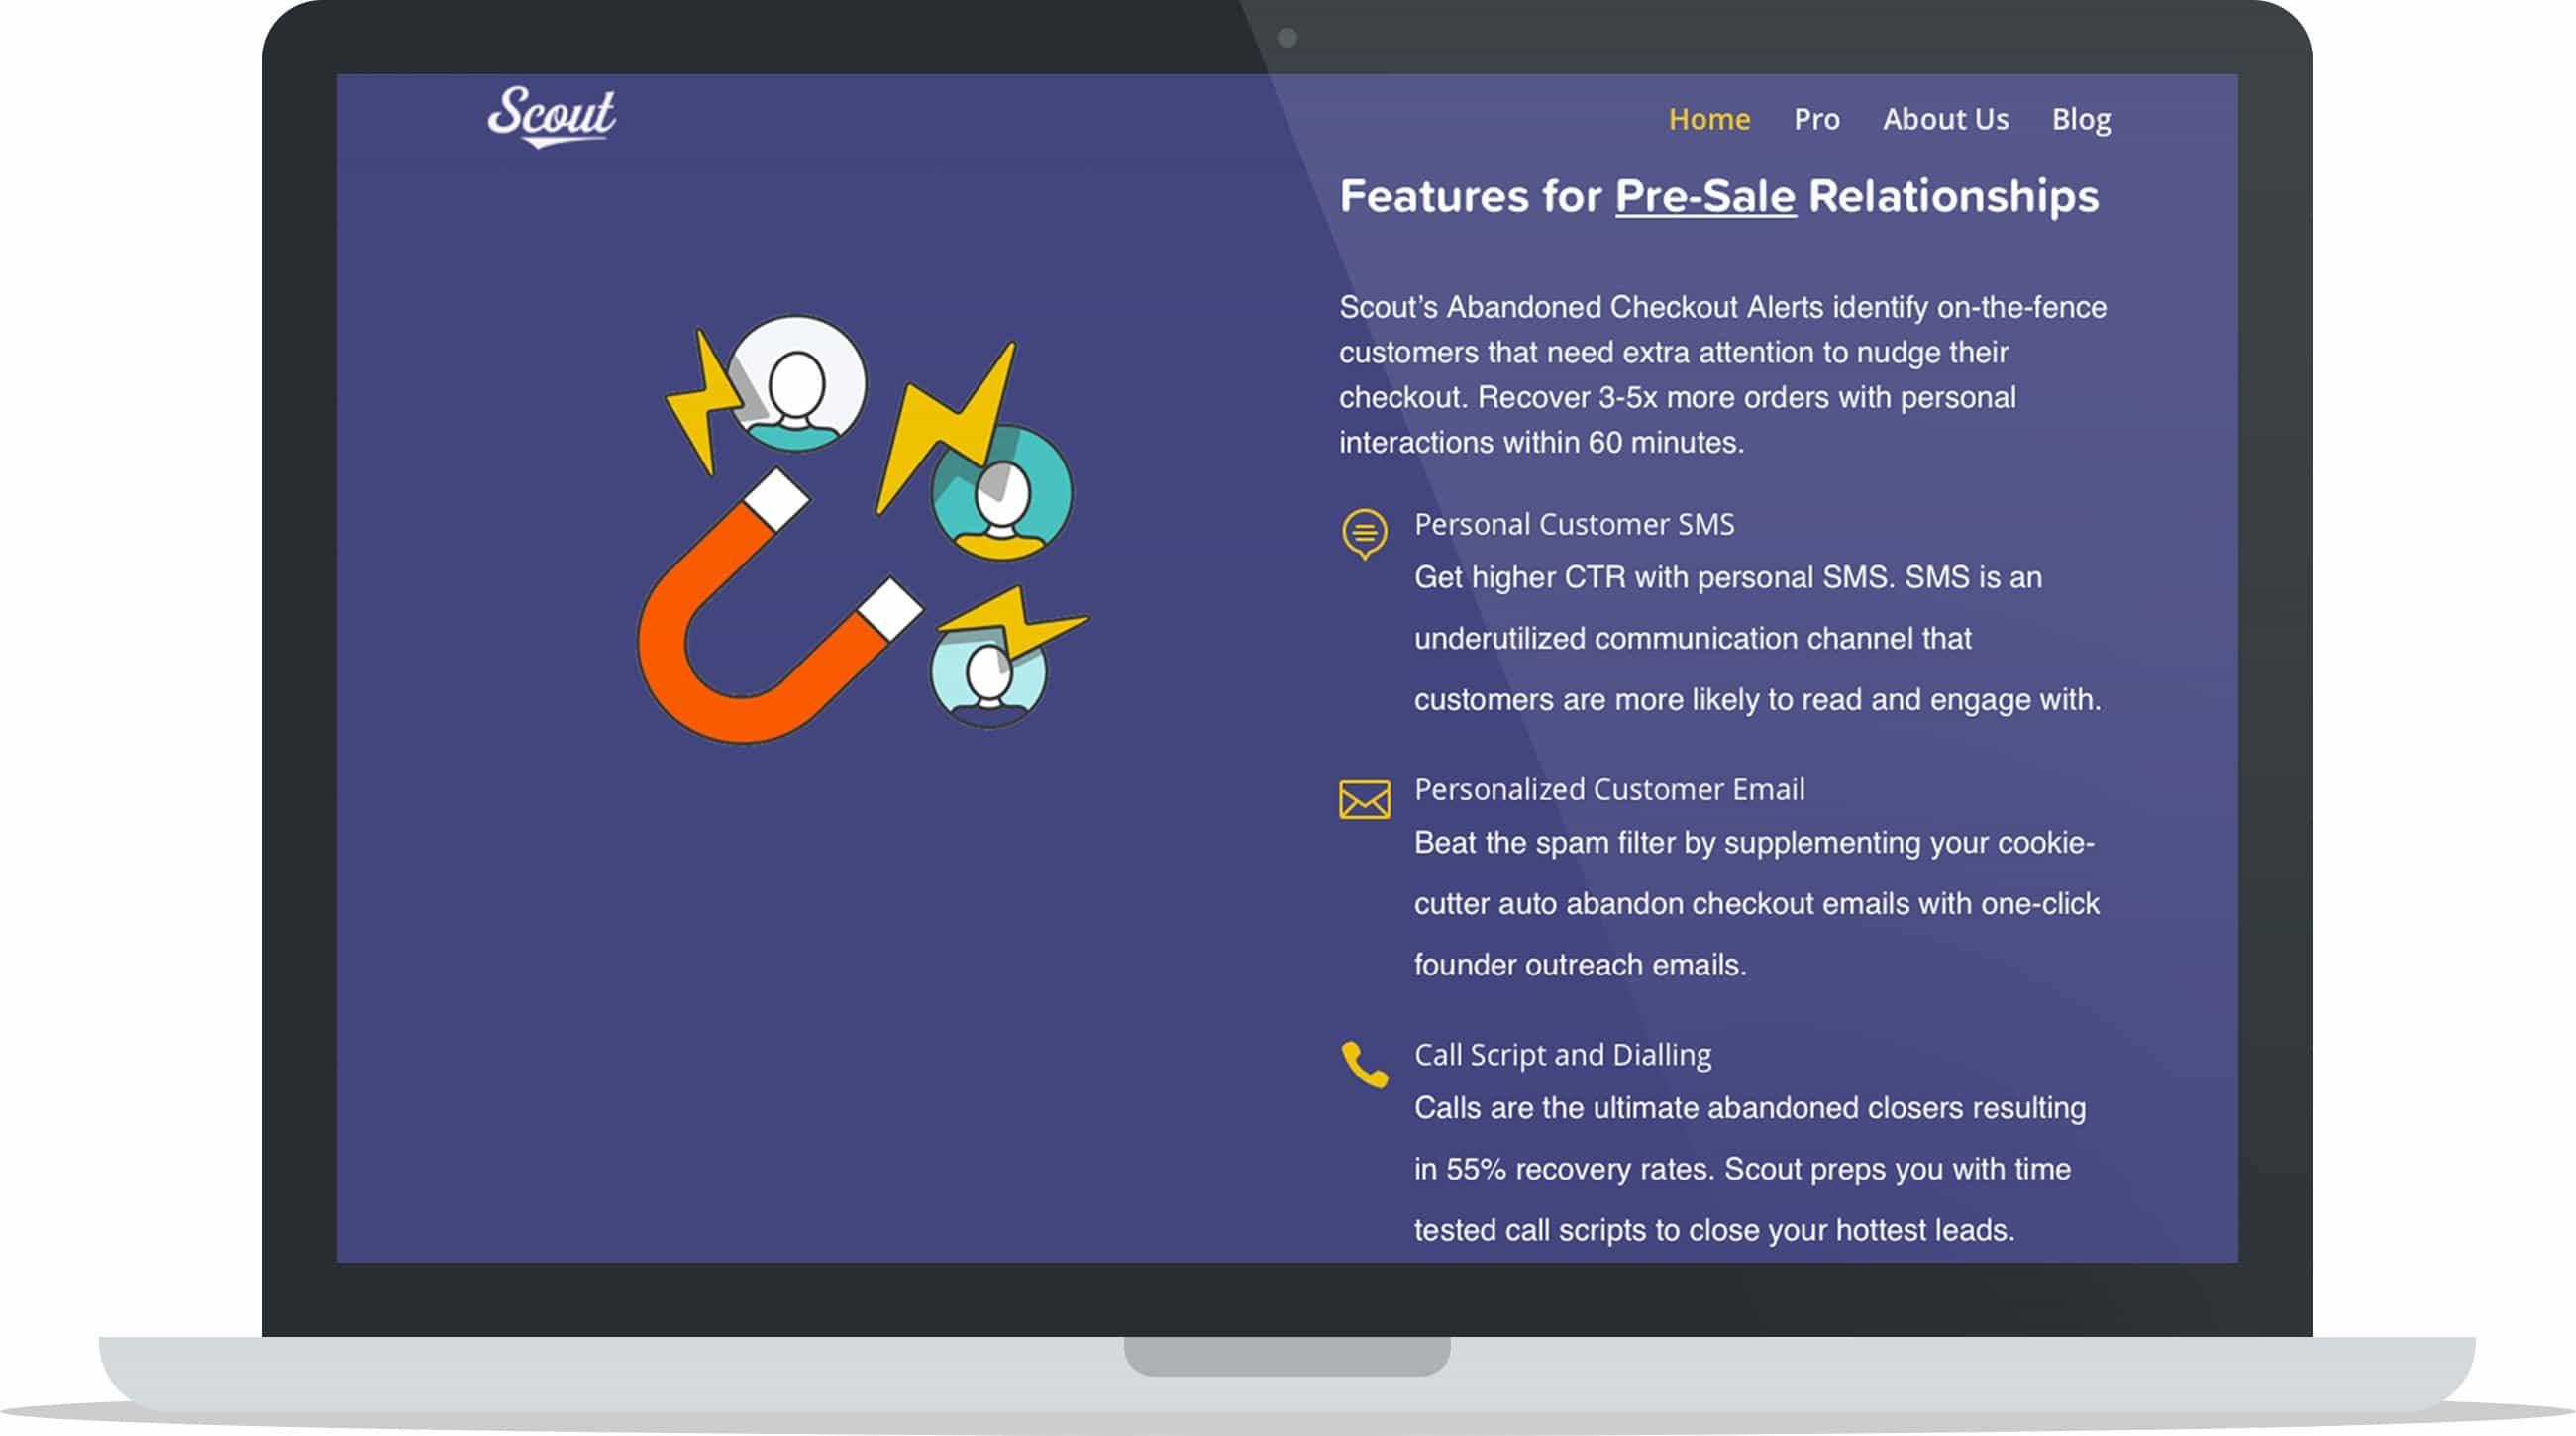 Shopify Scout App Features